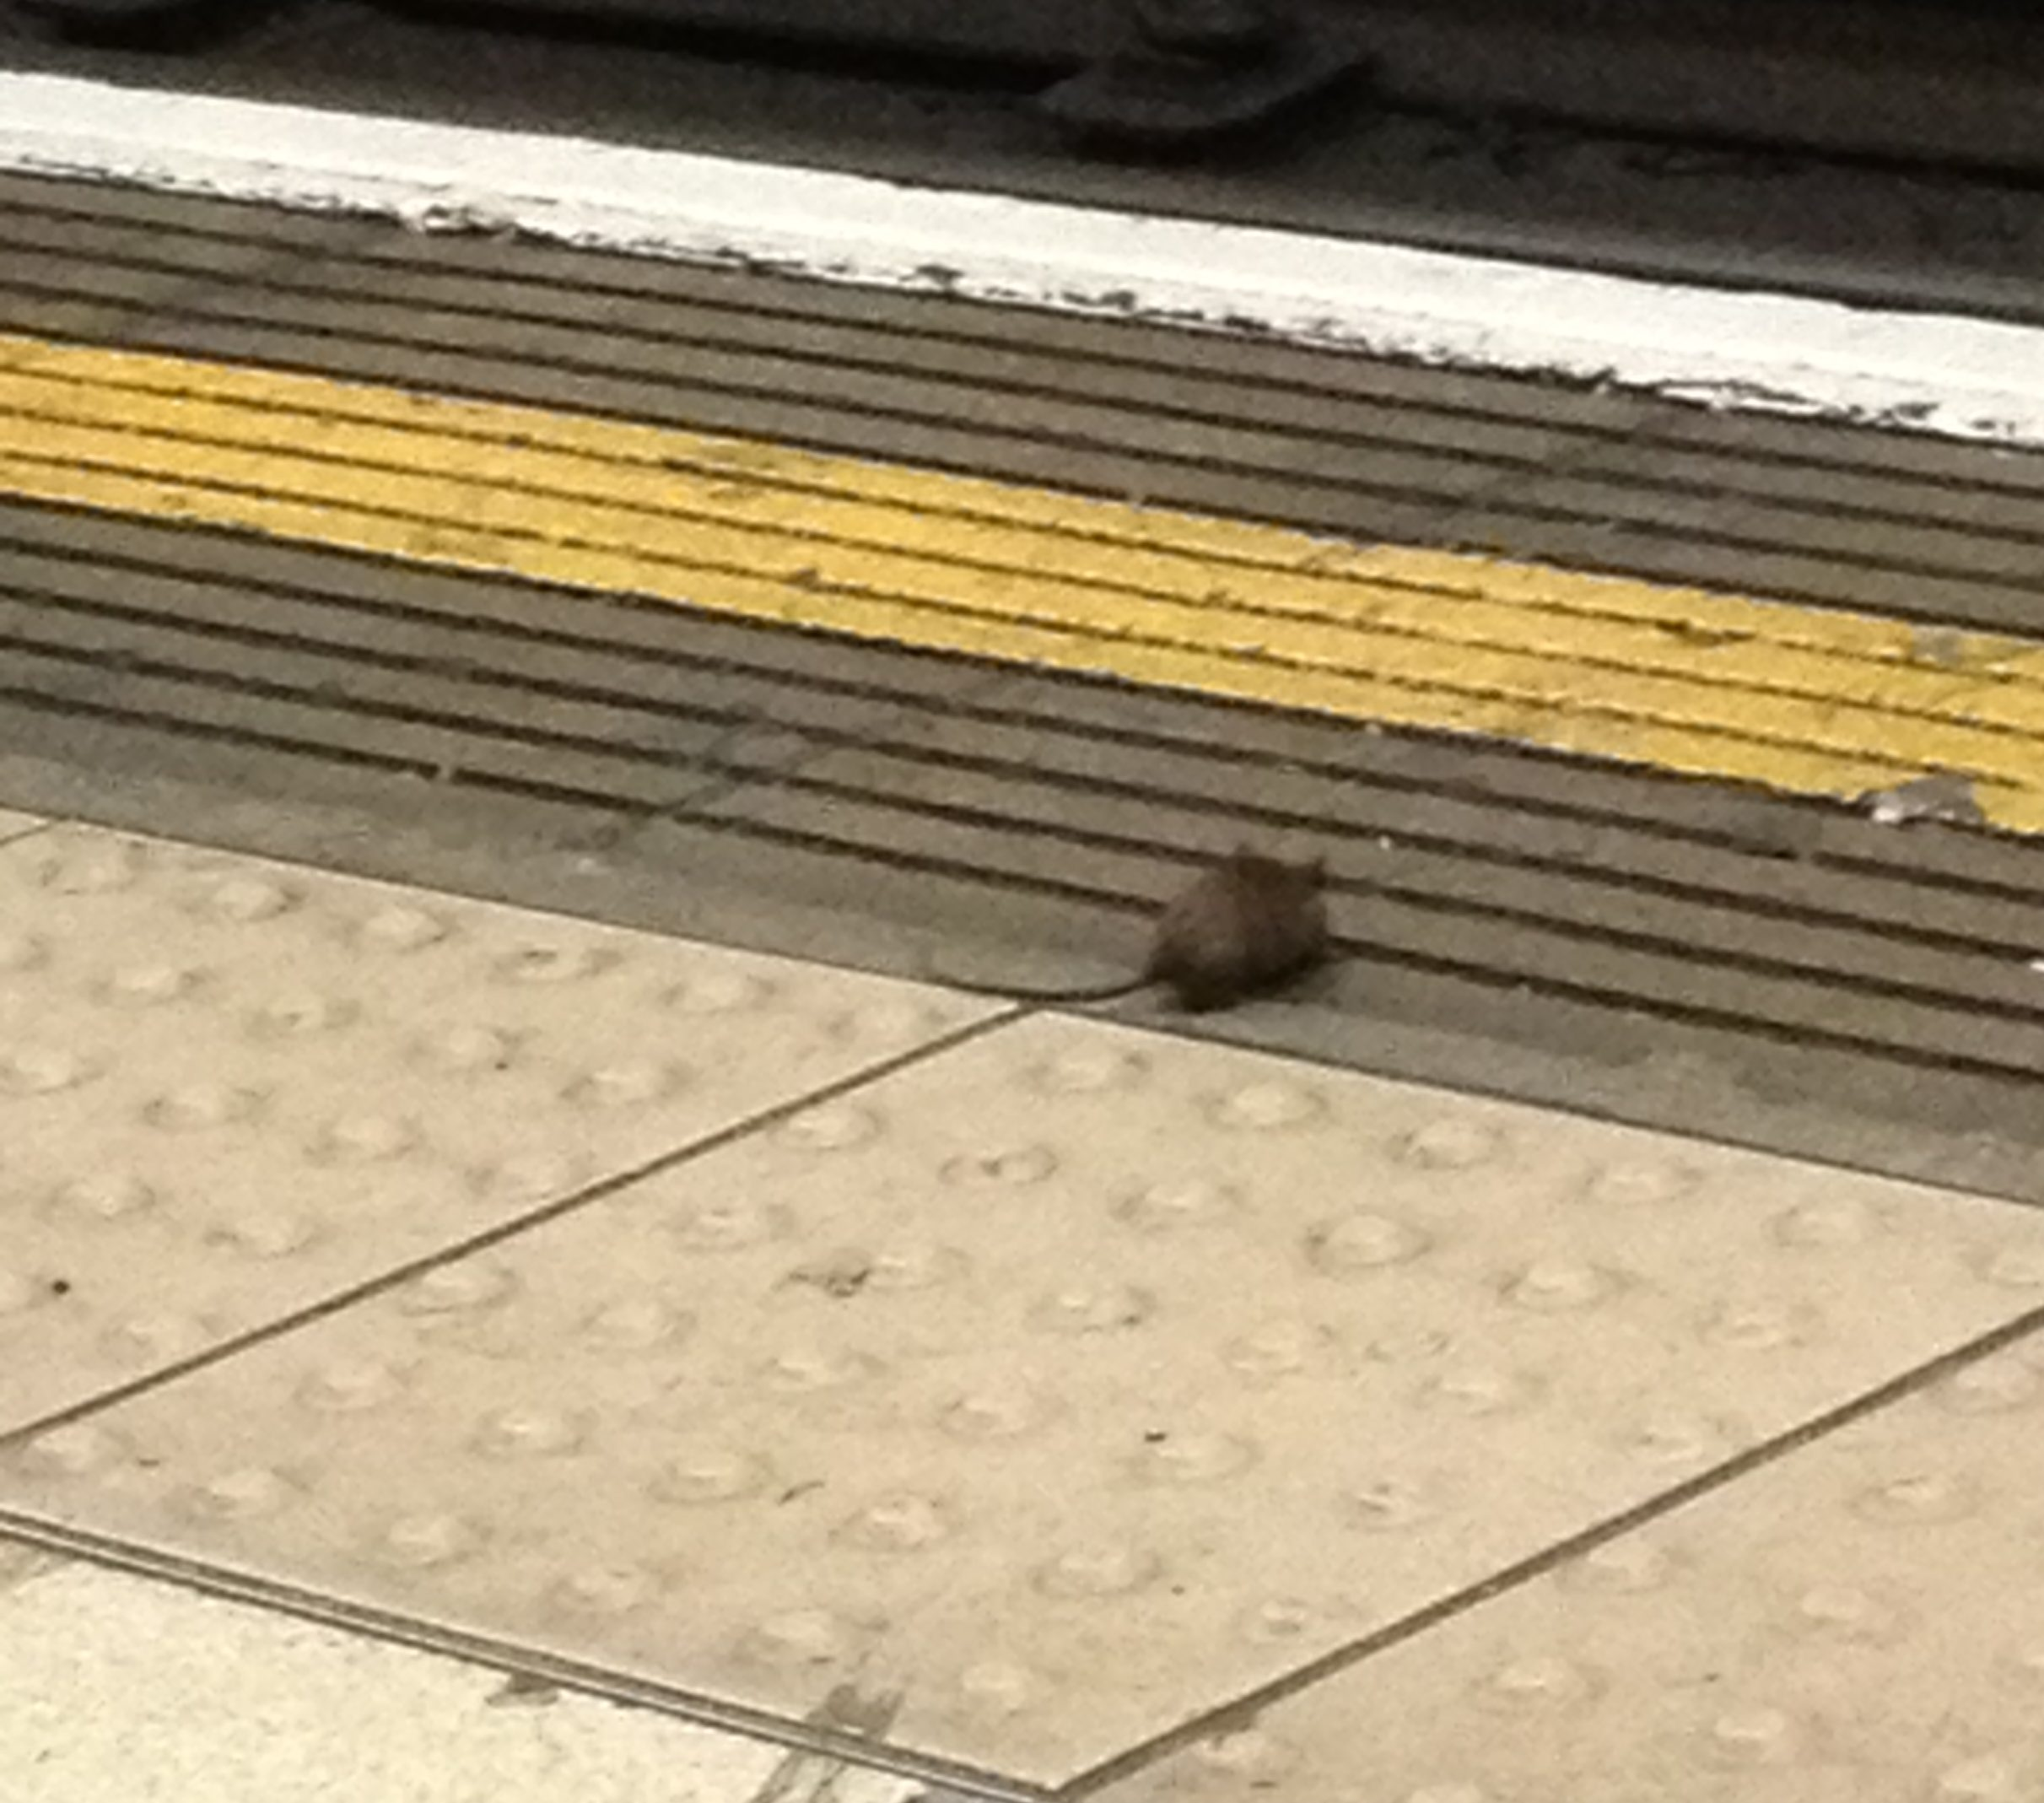 A mouse on a tube platform